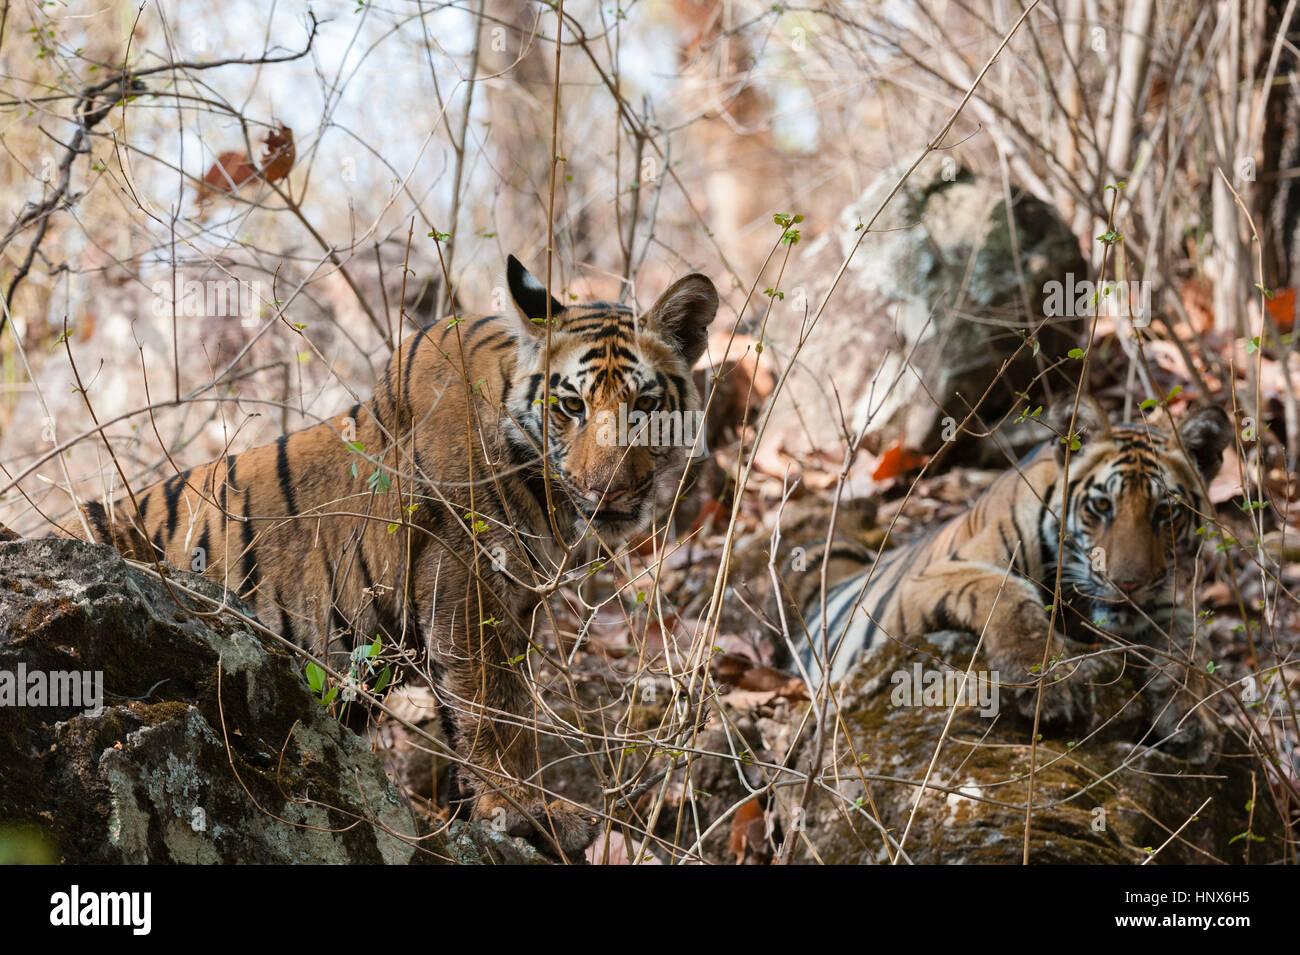 Bengal tiger cubs (Panthera tigris tigris), Bandhavgarh National Park, India - Stock Image